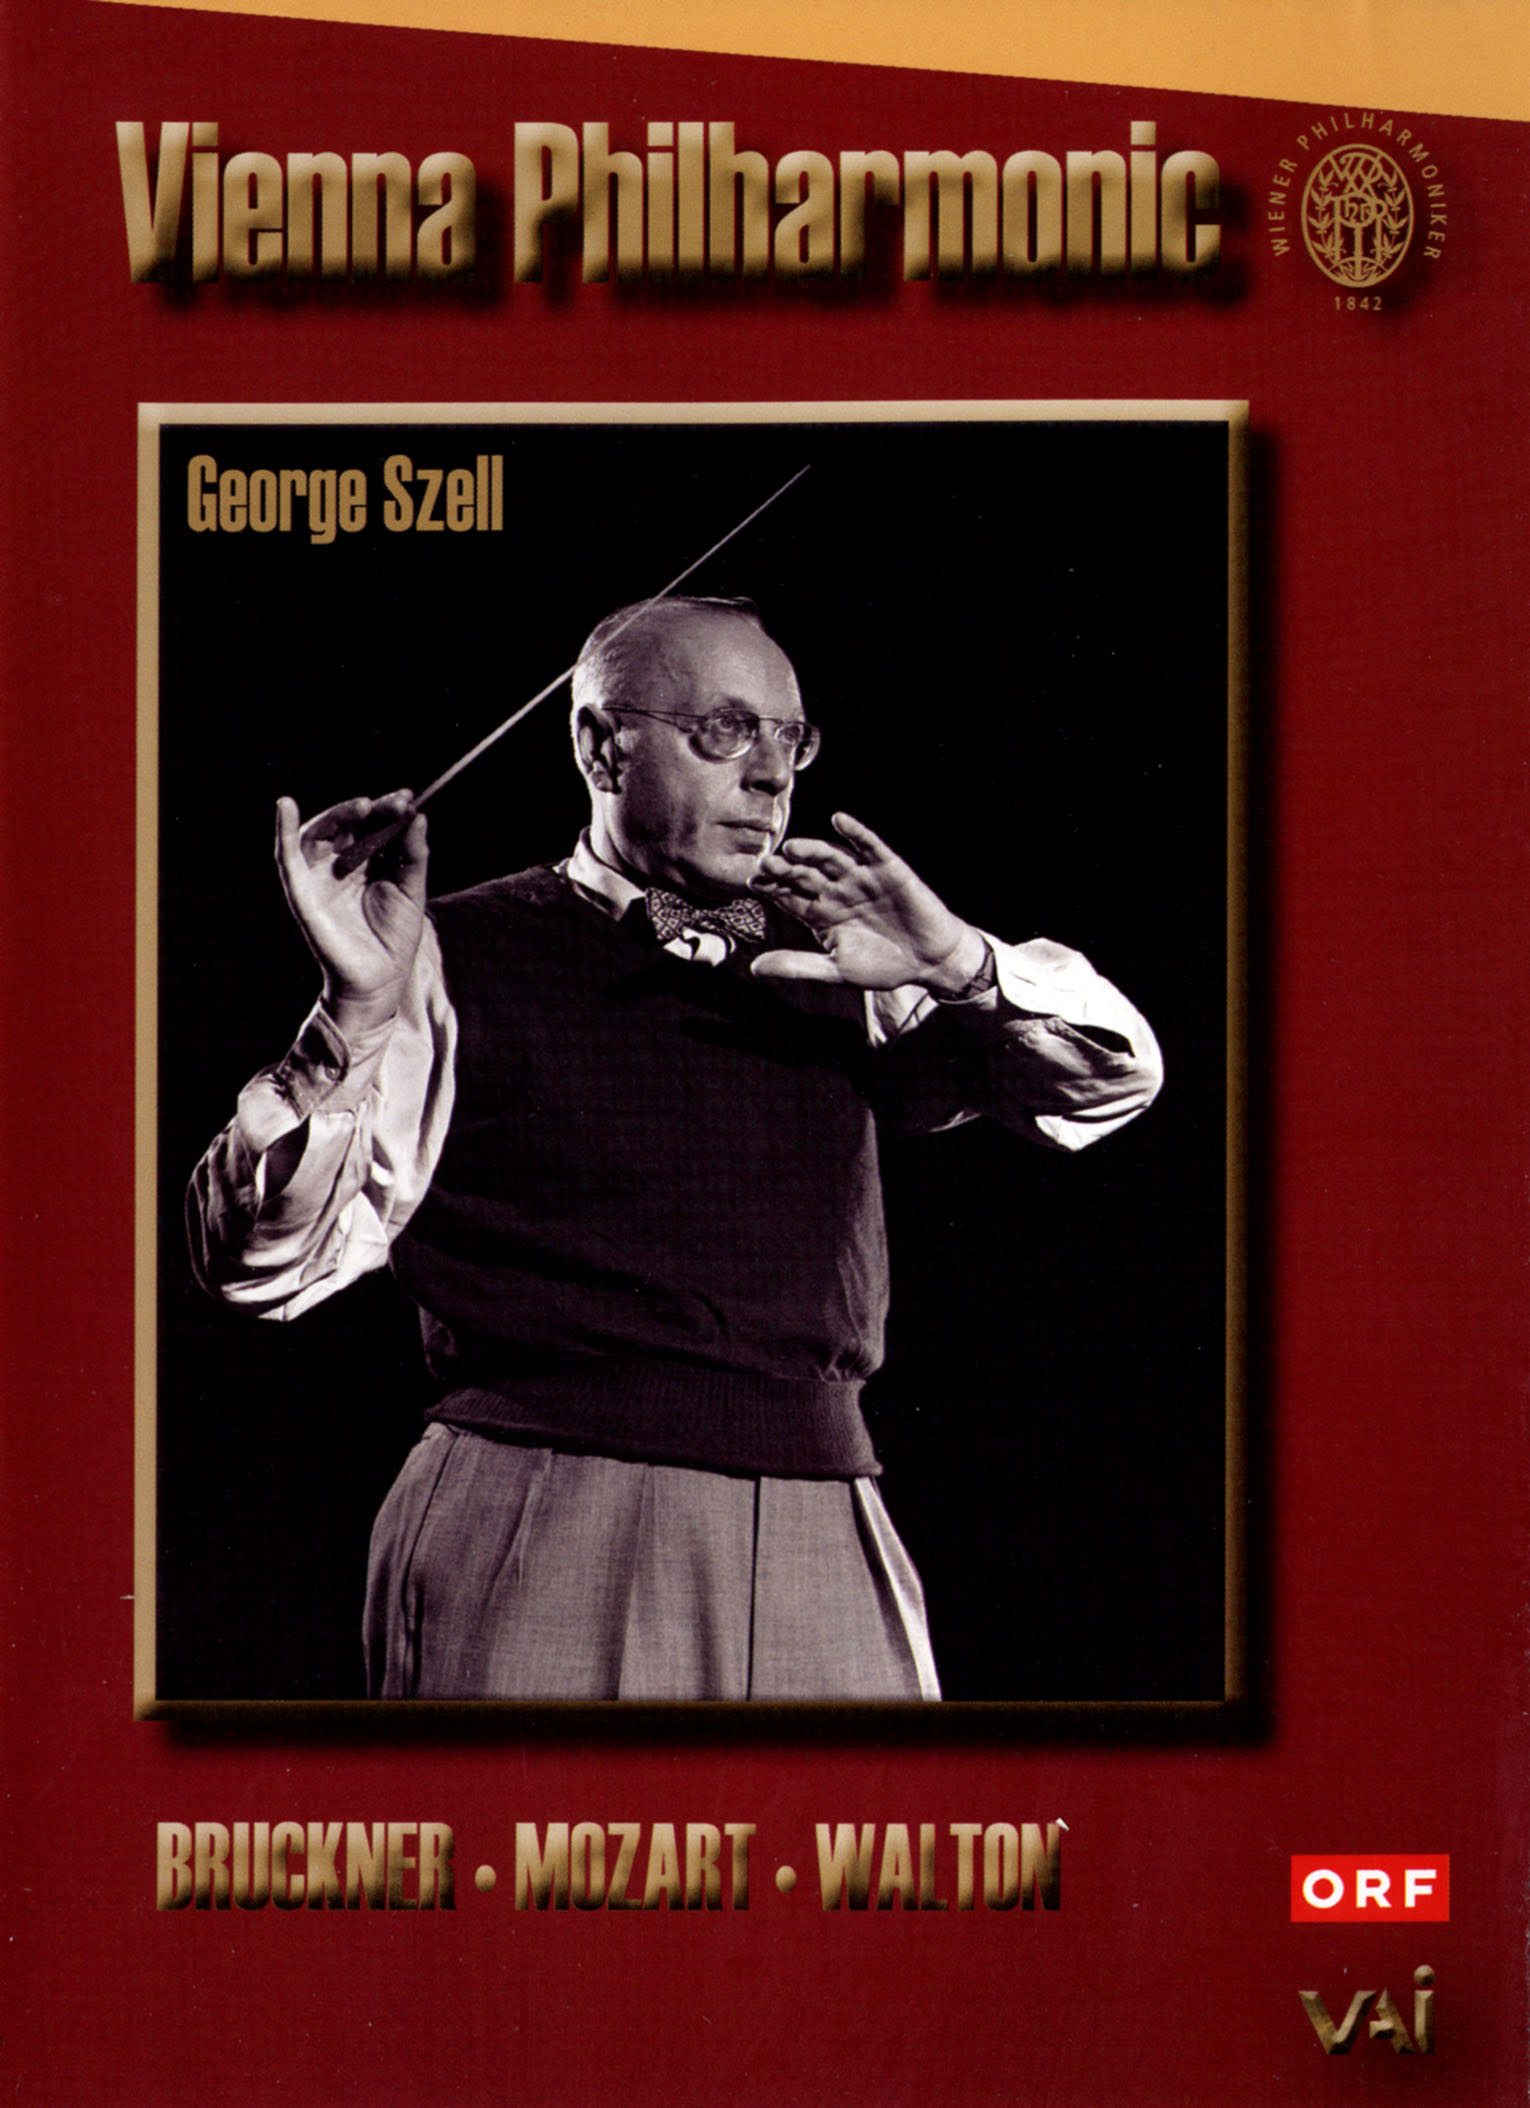 Vienna Philharmonic/George Szell: Bruckner/Mozart/Walton